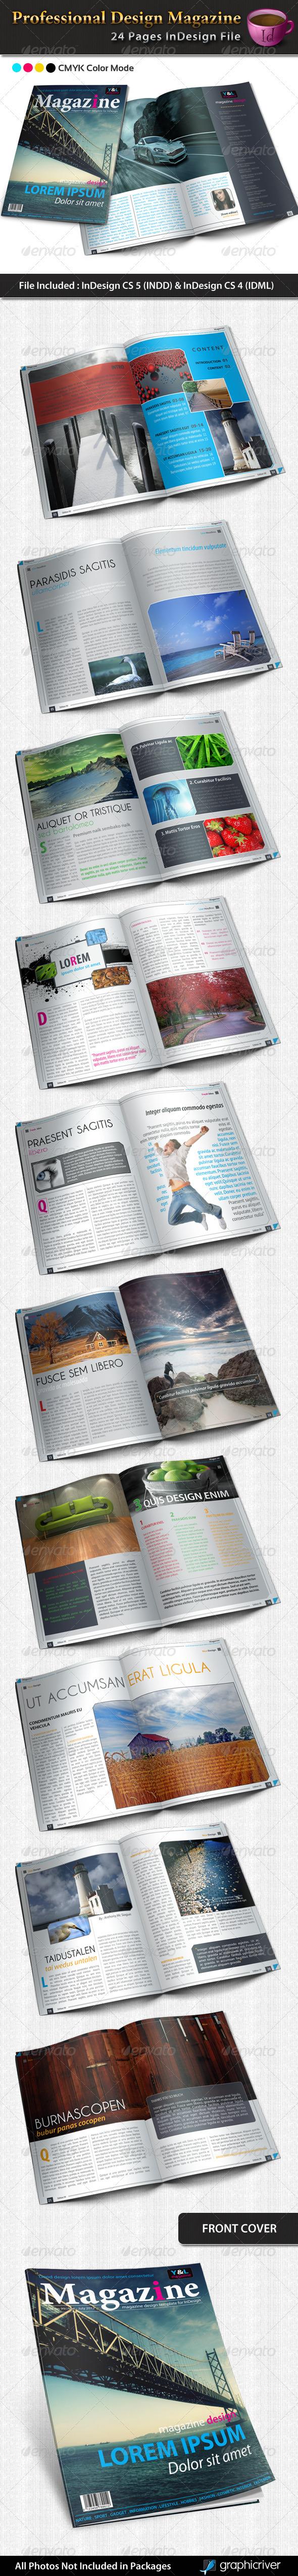 Professional Design Magazine Template - Magazines Print Templates